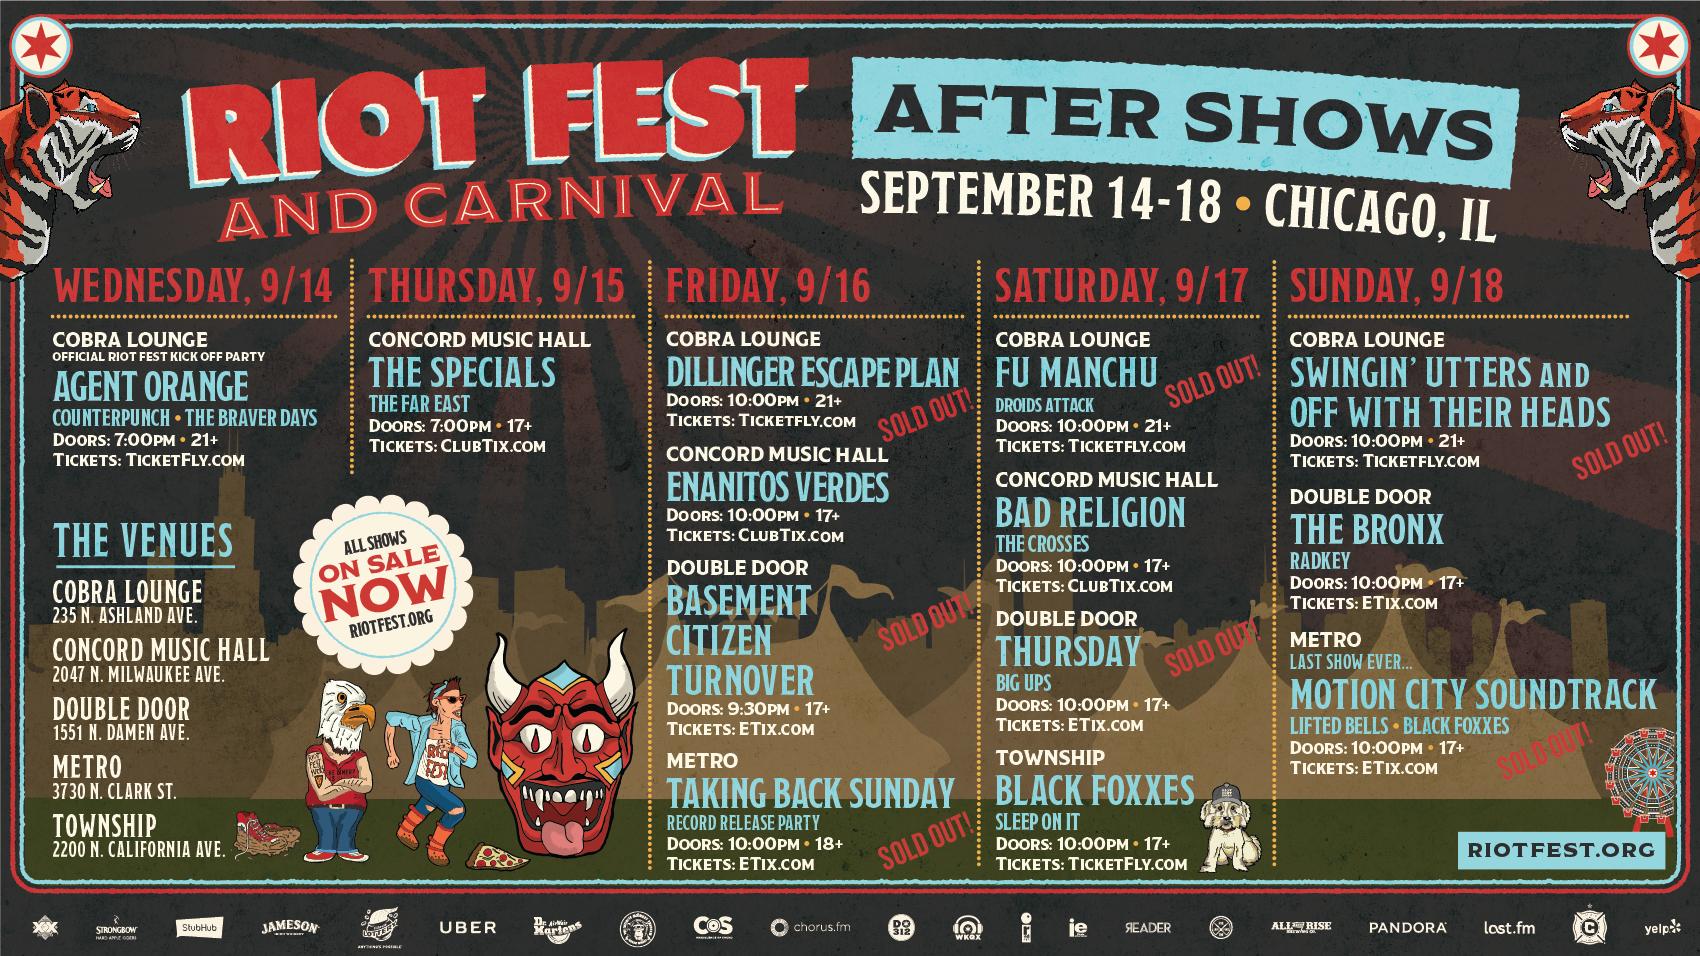 Riot Fest & Carnival After Shows | Riot Fest